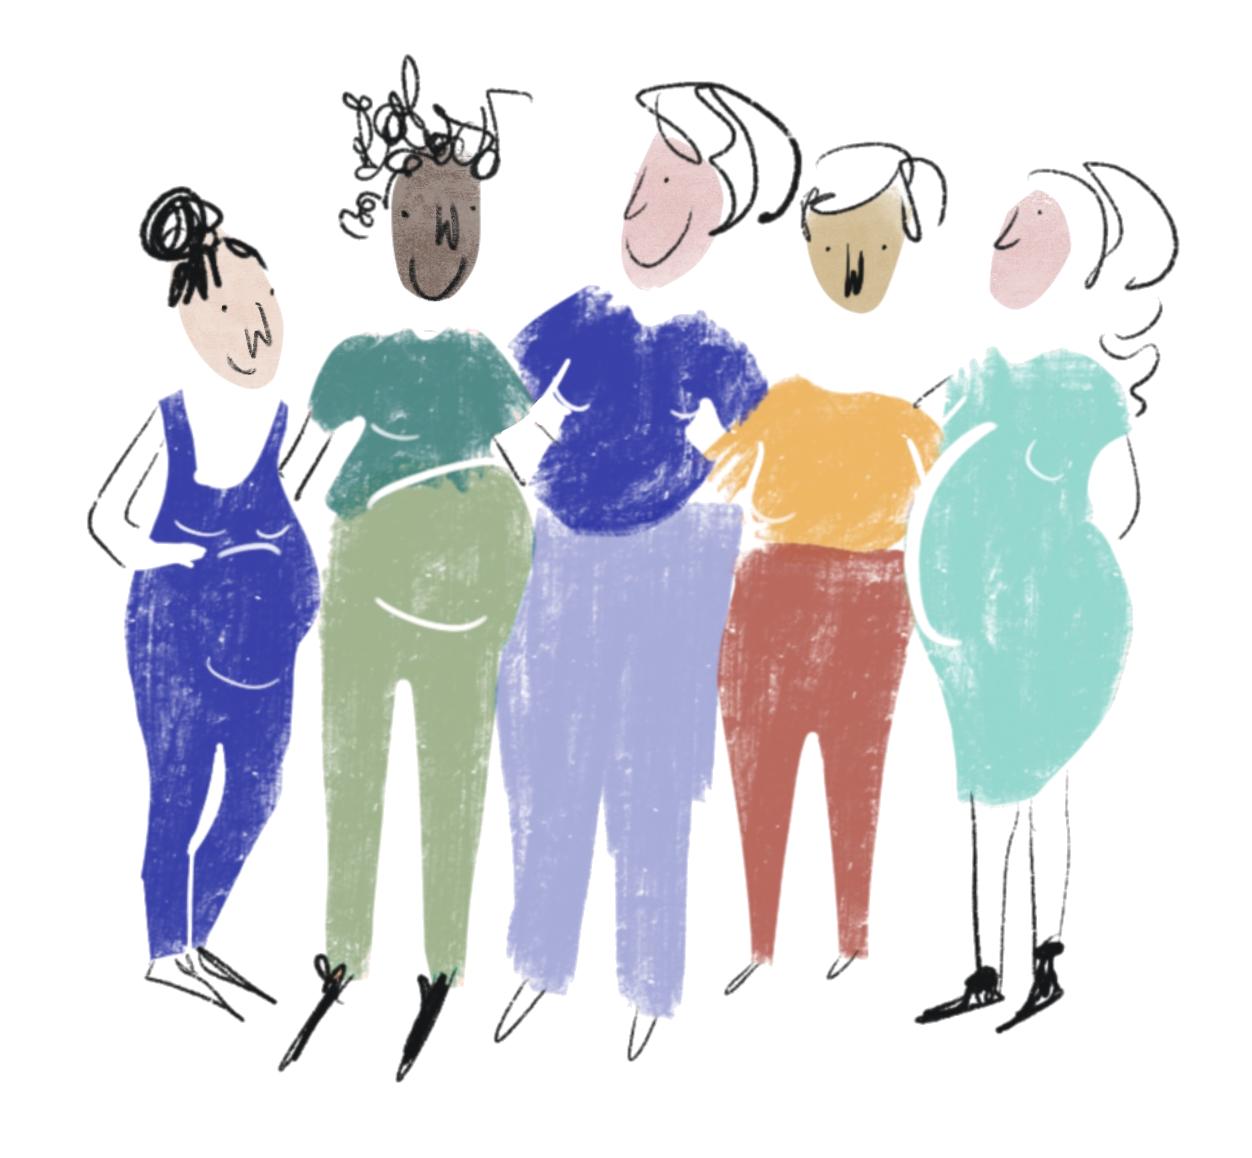 Illustration by Merlin Strangeway